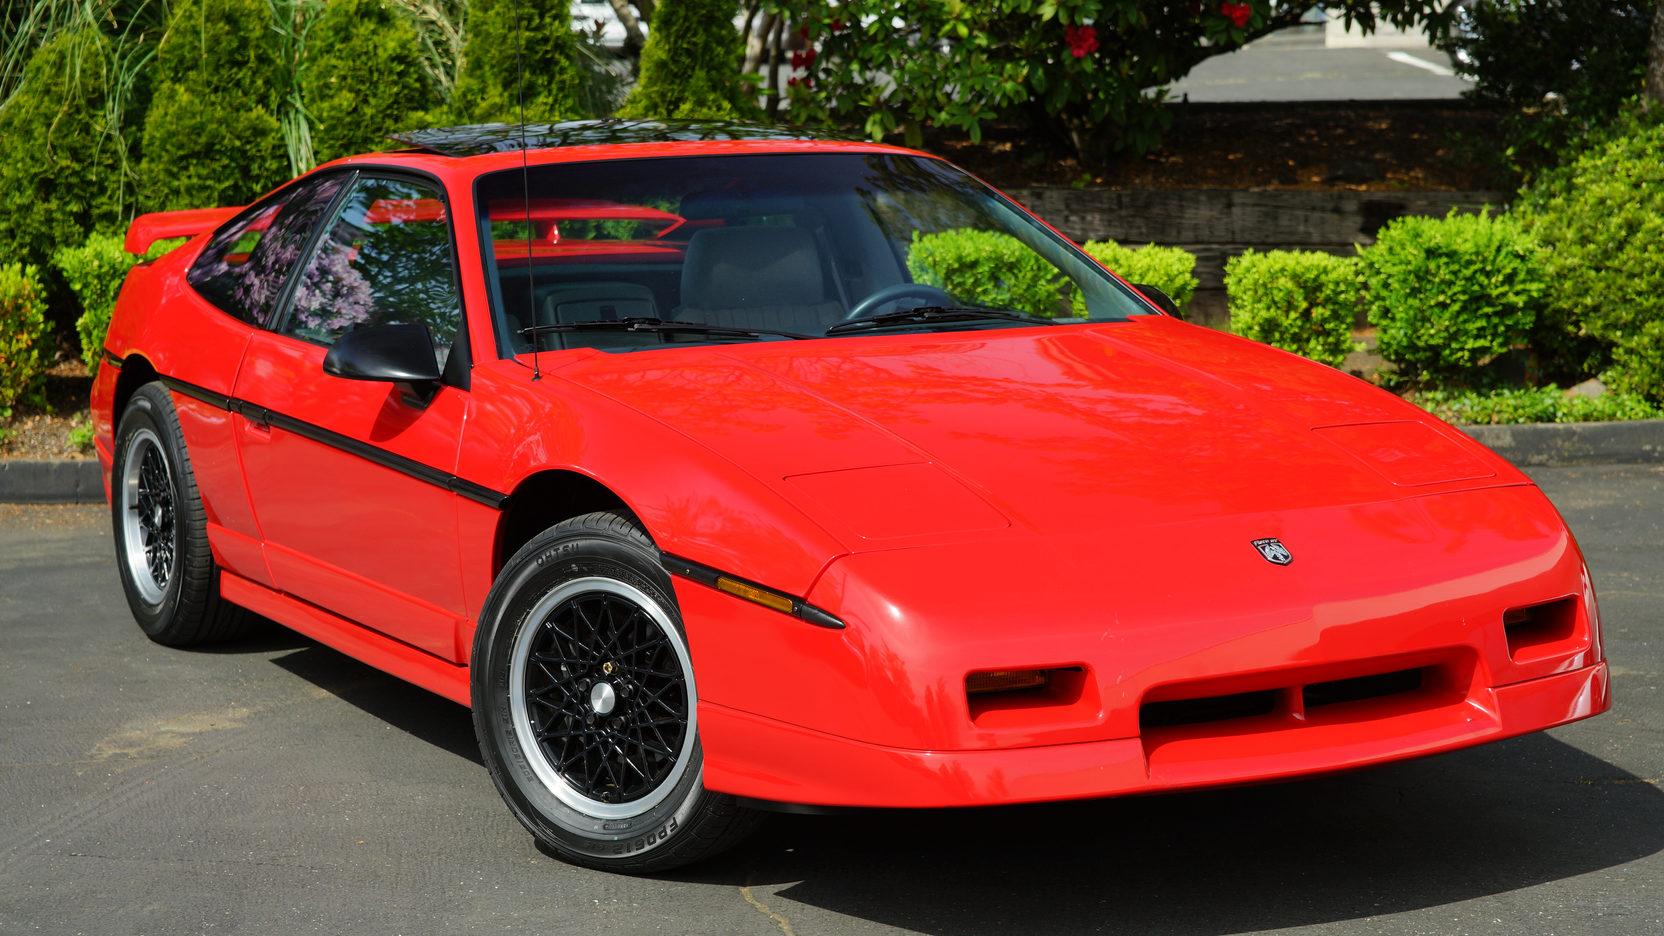 1986 Pontiac Fiero GT front 3/4